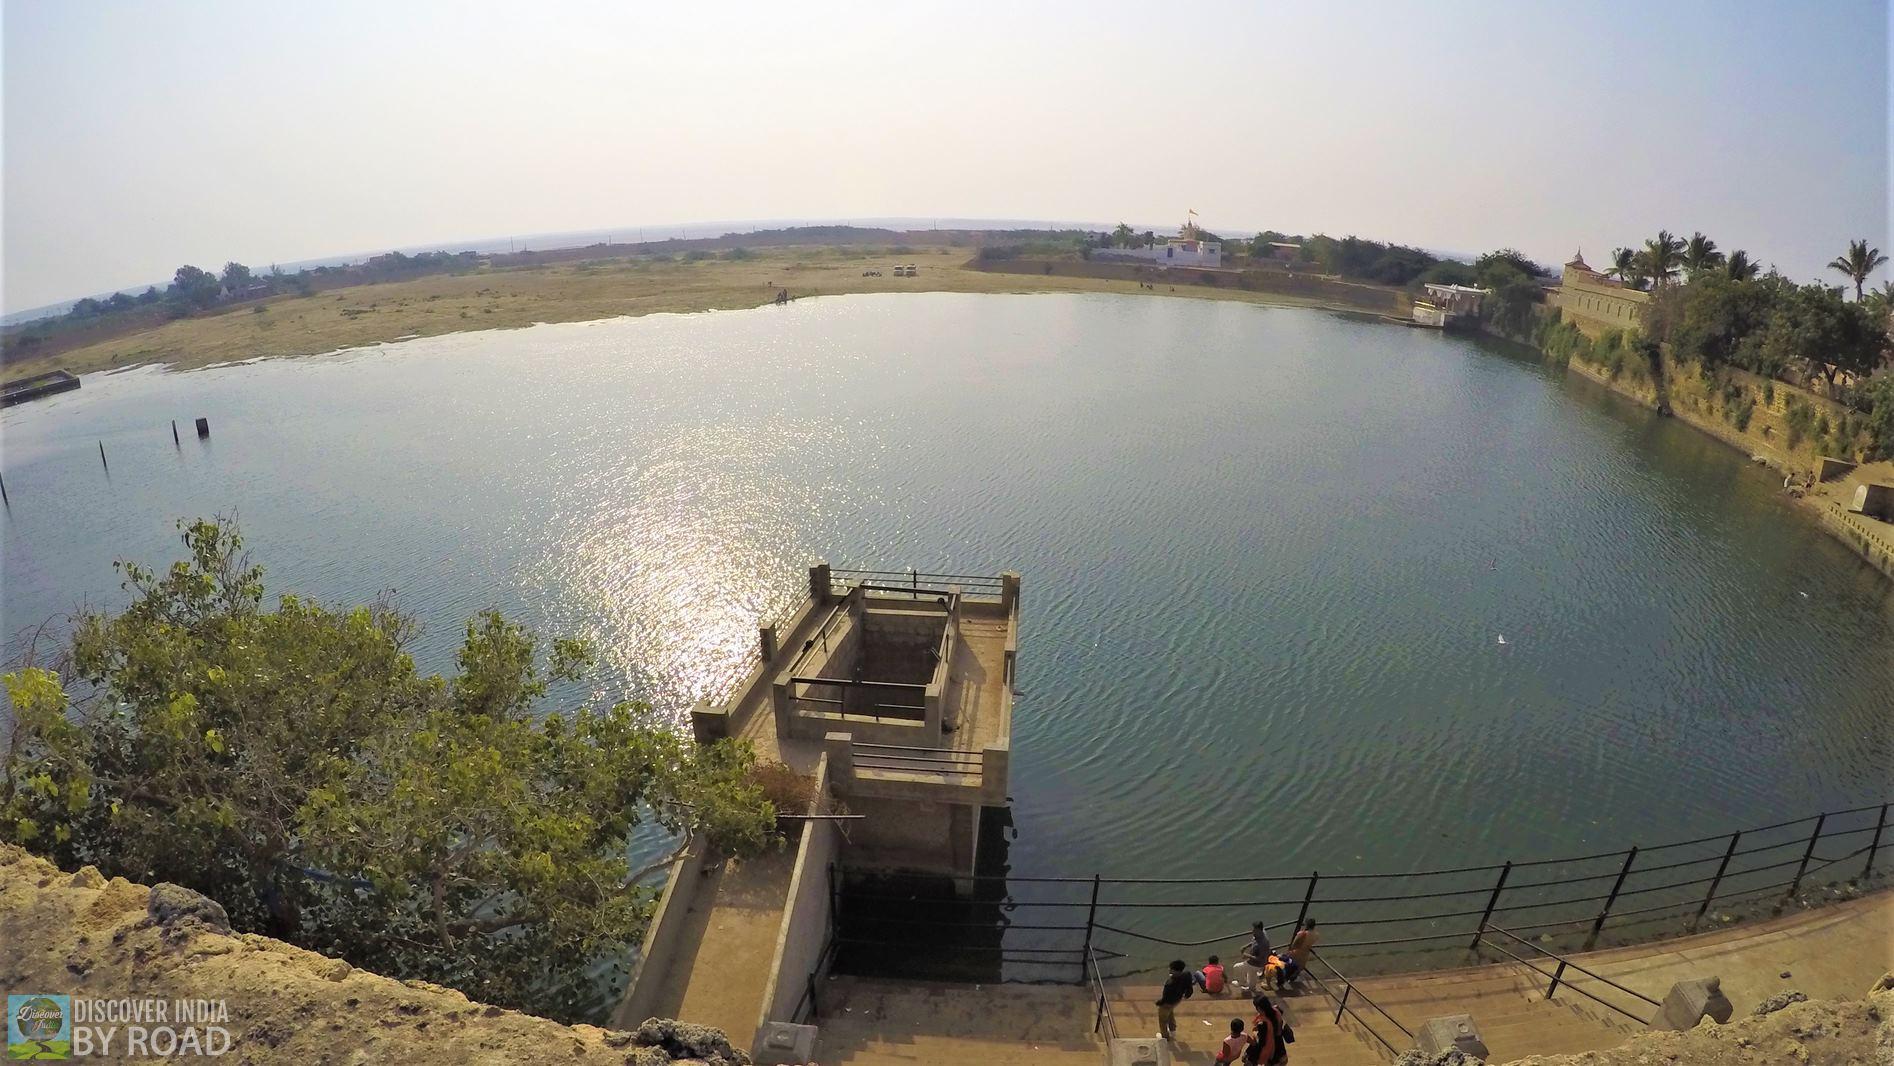 View of Narayan Sarovar from top of wall